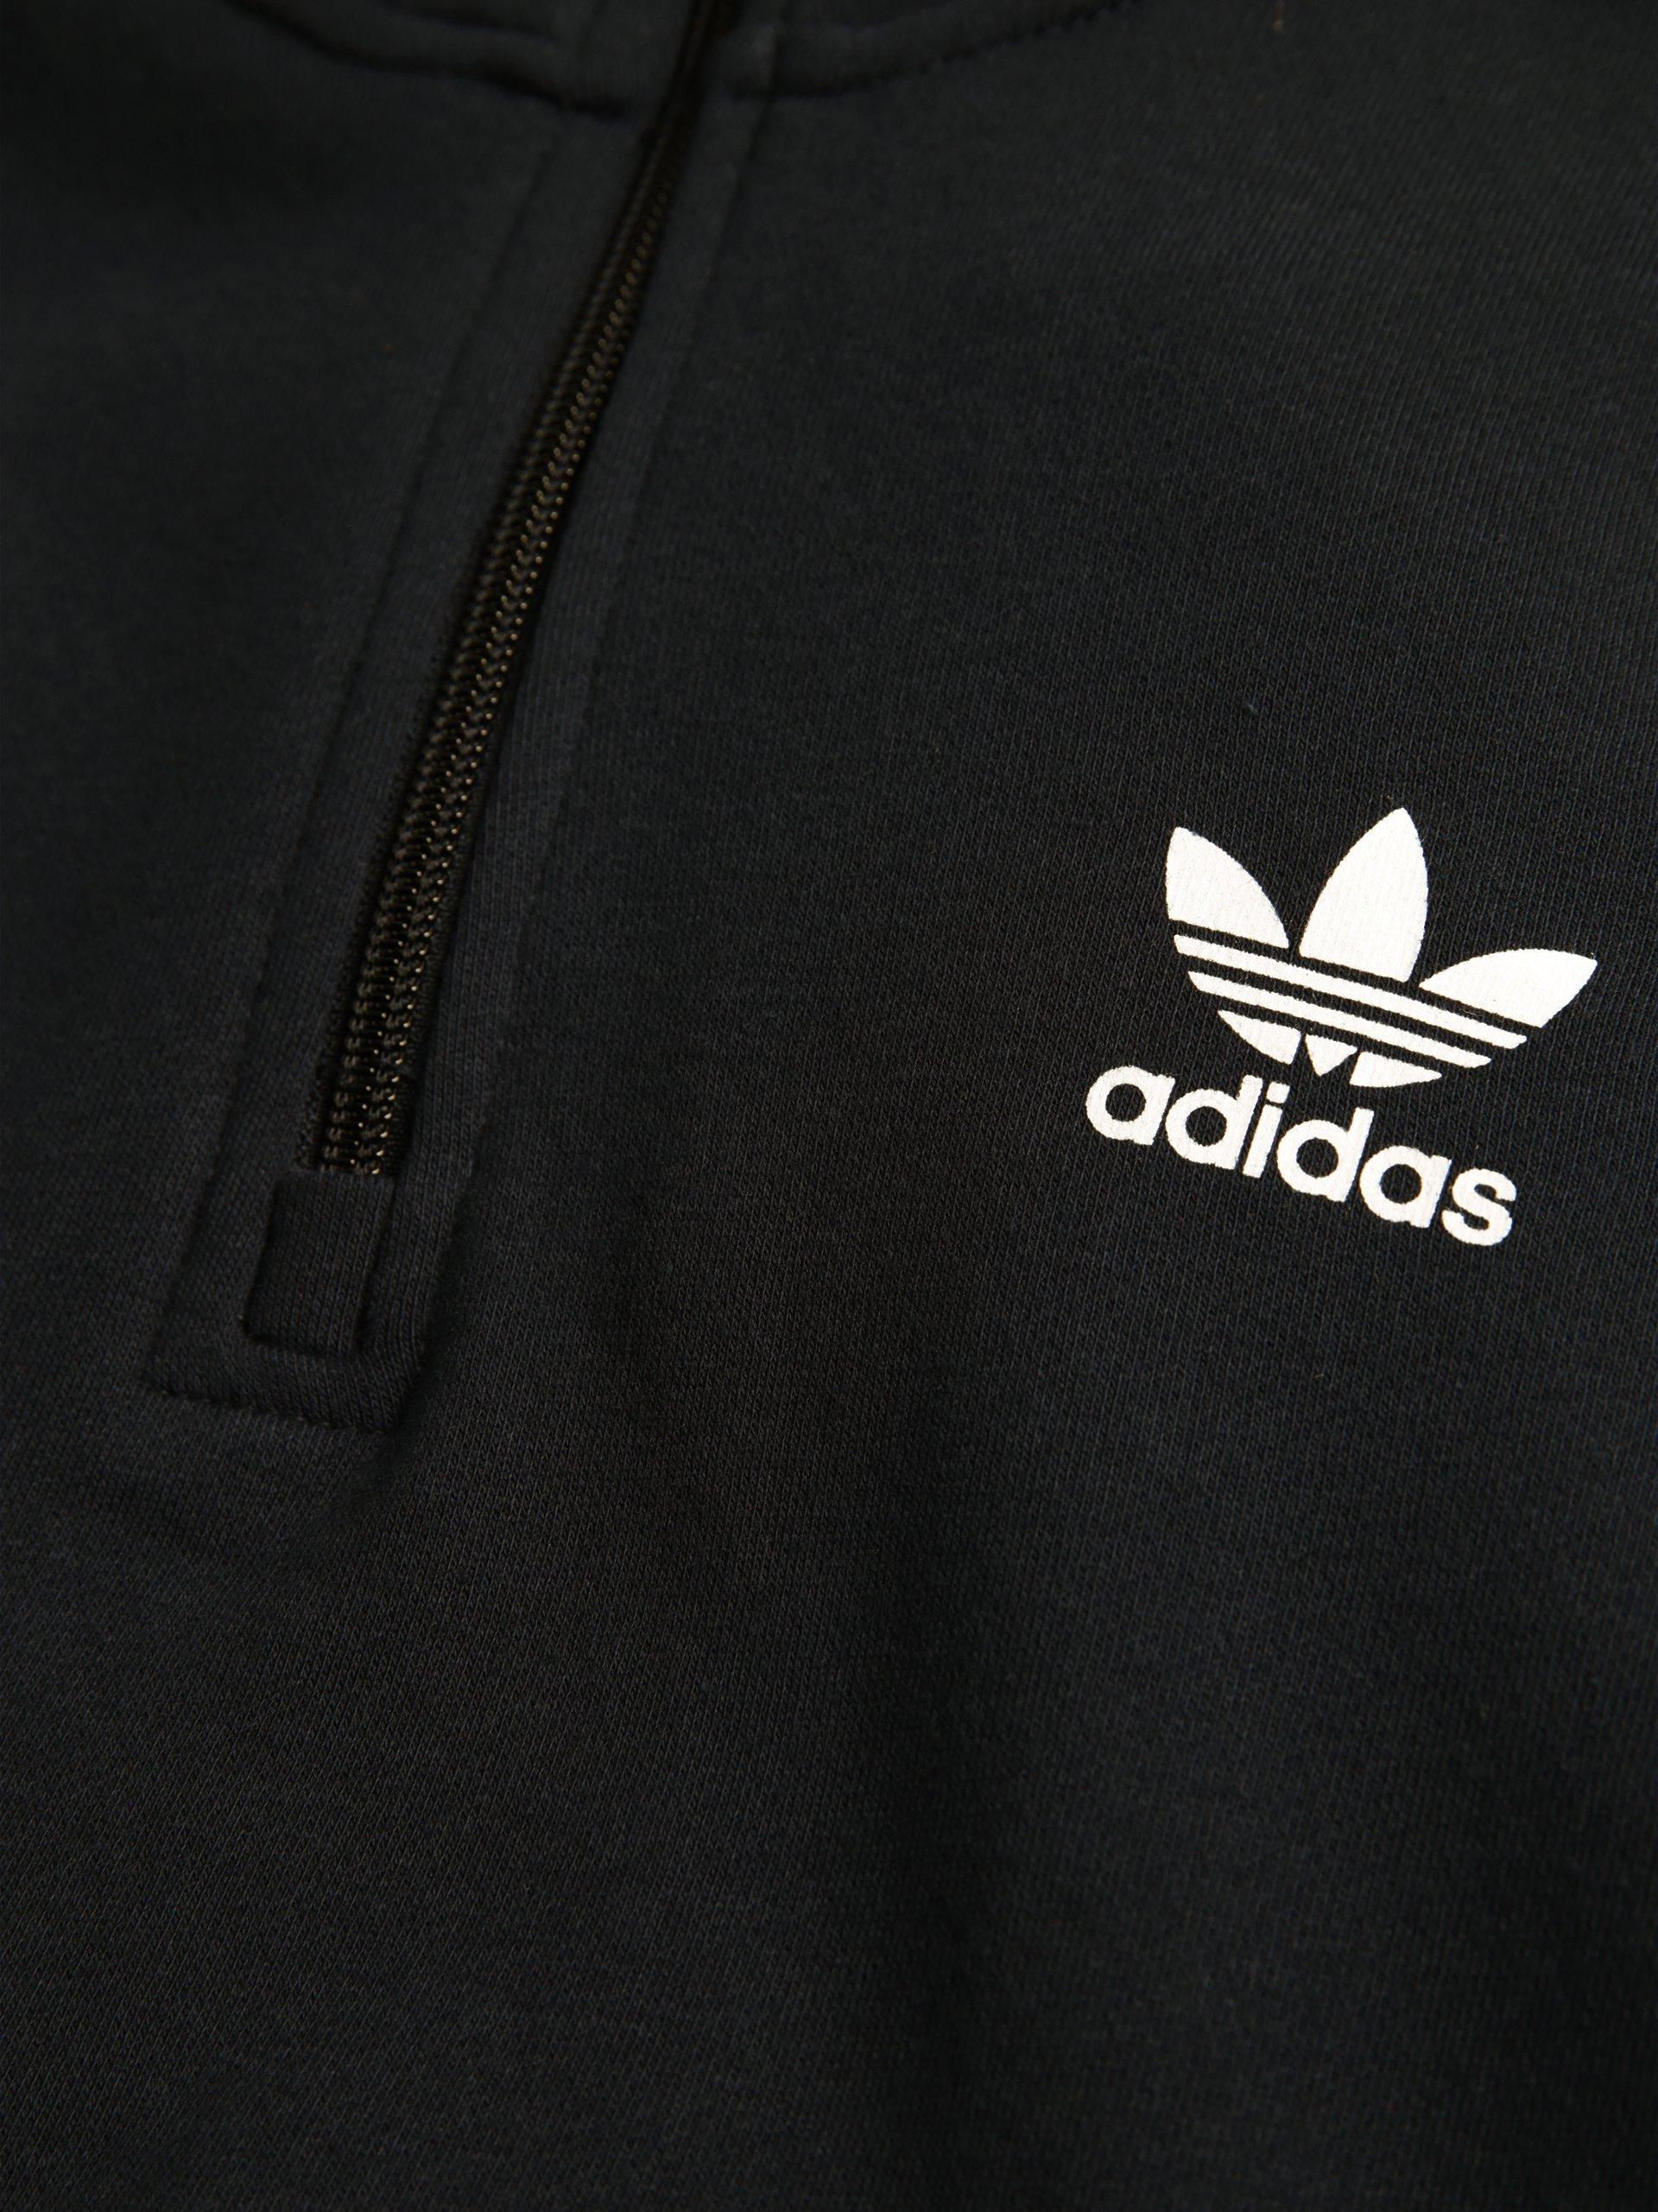 adidas Originals Jungen Sweatjacke